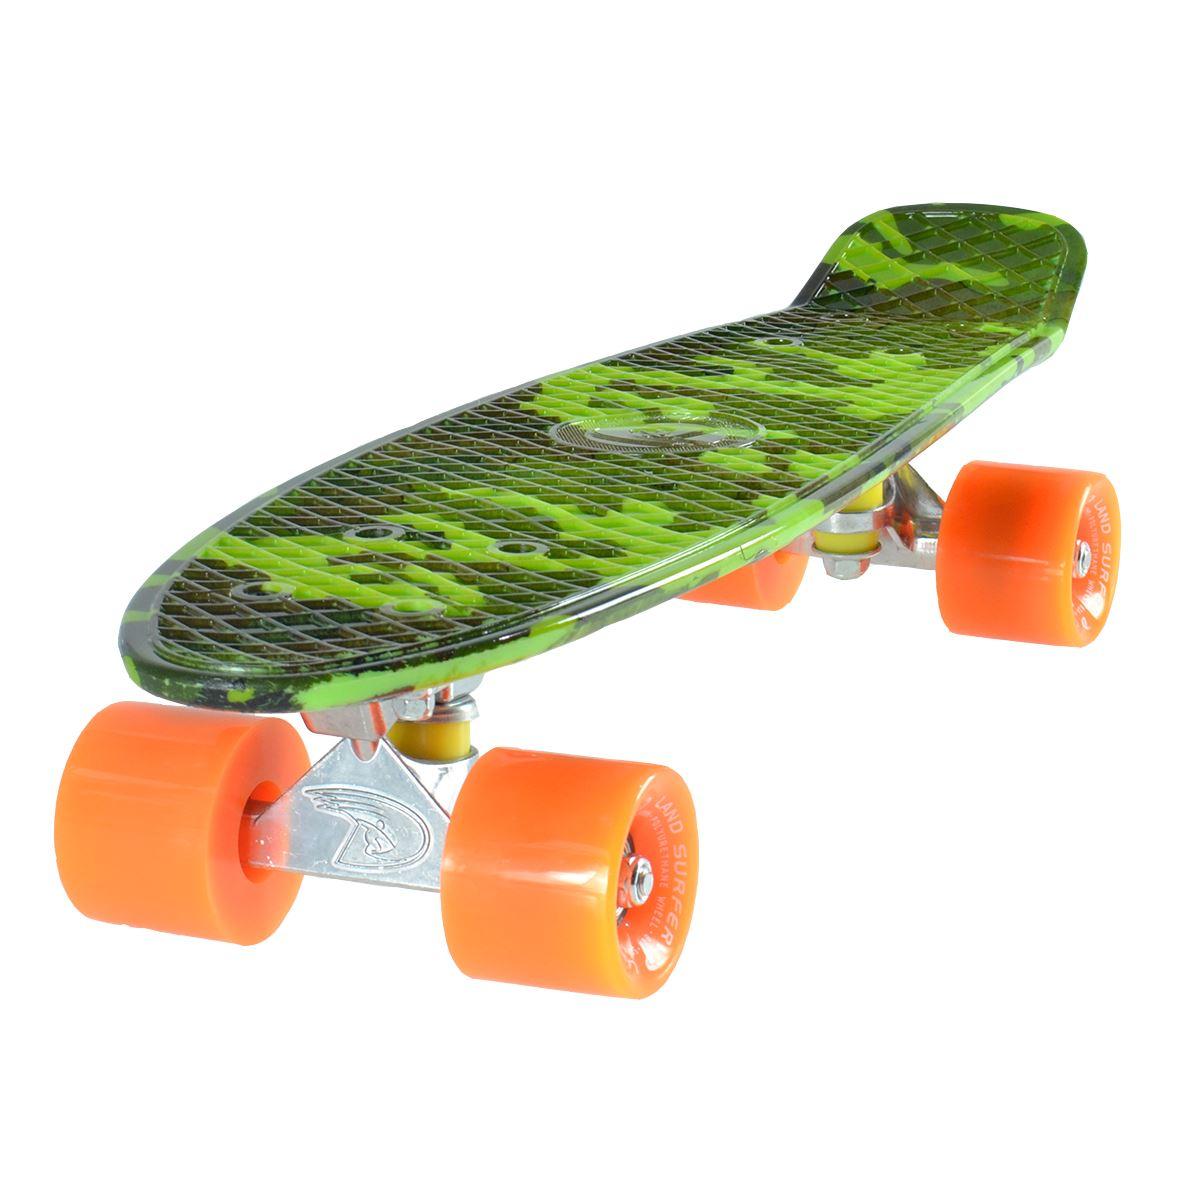 land surfer cruiser skateboard 22 39 39 camouflage brett solid orange reifen ebay. Black Bedroom Furniture Sets. Home Design Ideas